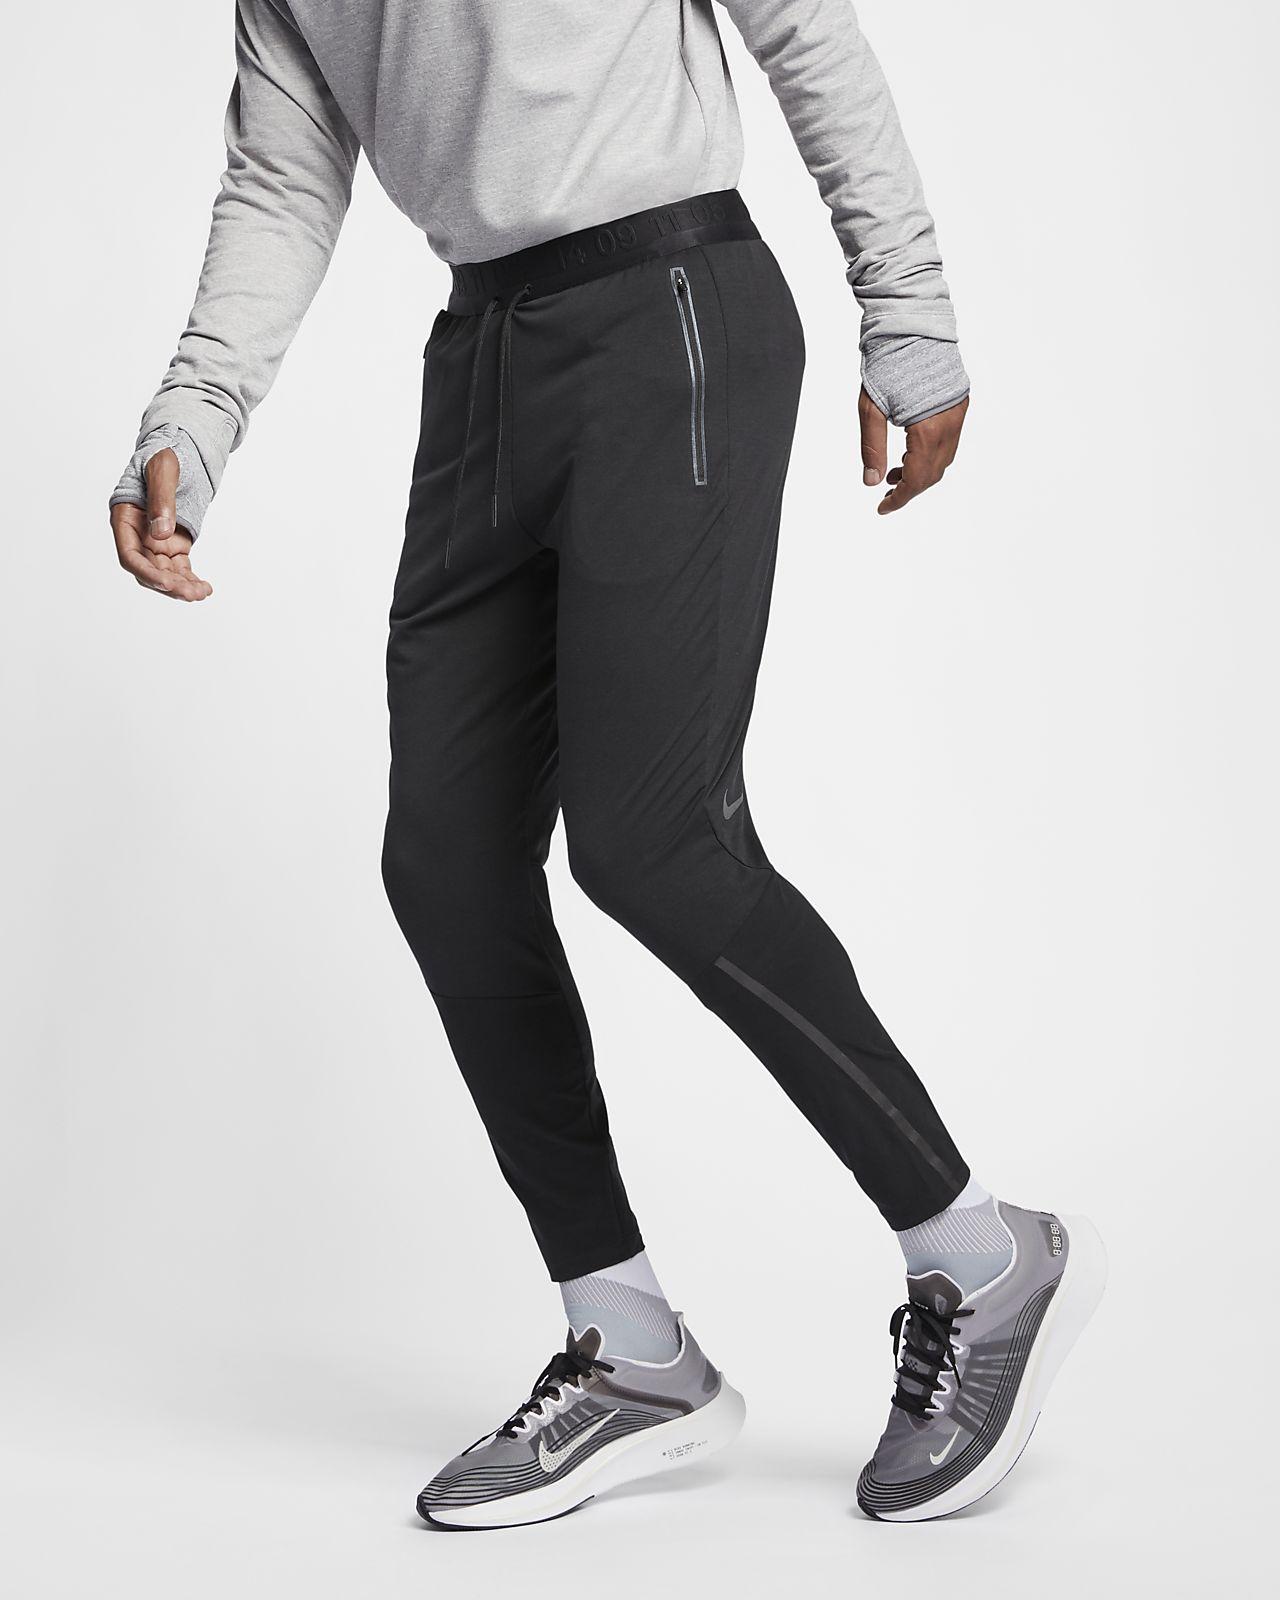 Calças de running Nike Therma Sphere Tech Pack para homem